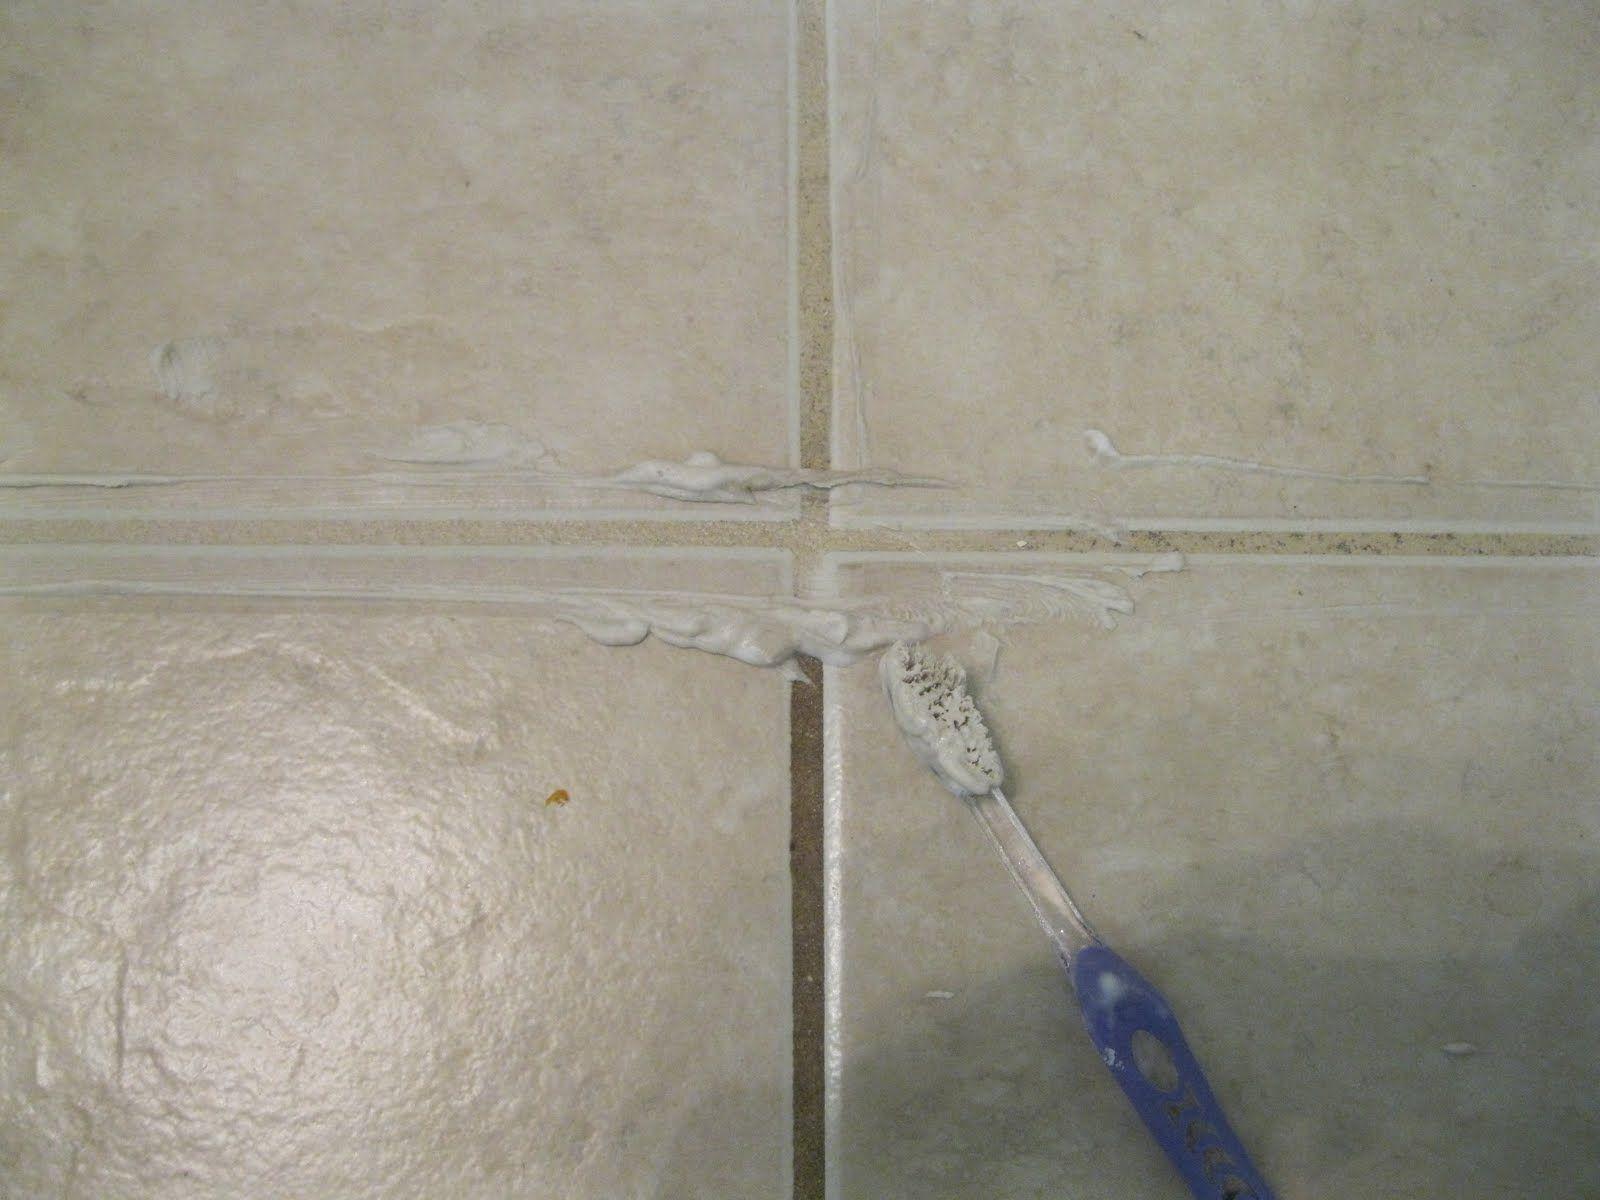 Grout Cleaner White Vinegar Baking Soda Cream Of Tartar Ammonia Hydrogen Peroxide